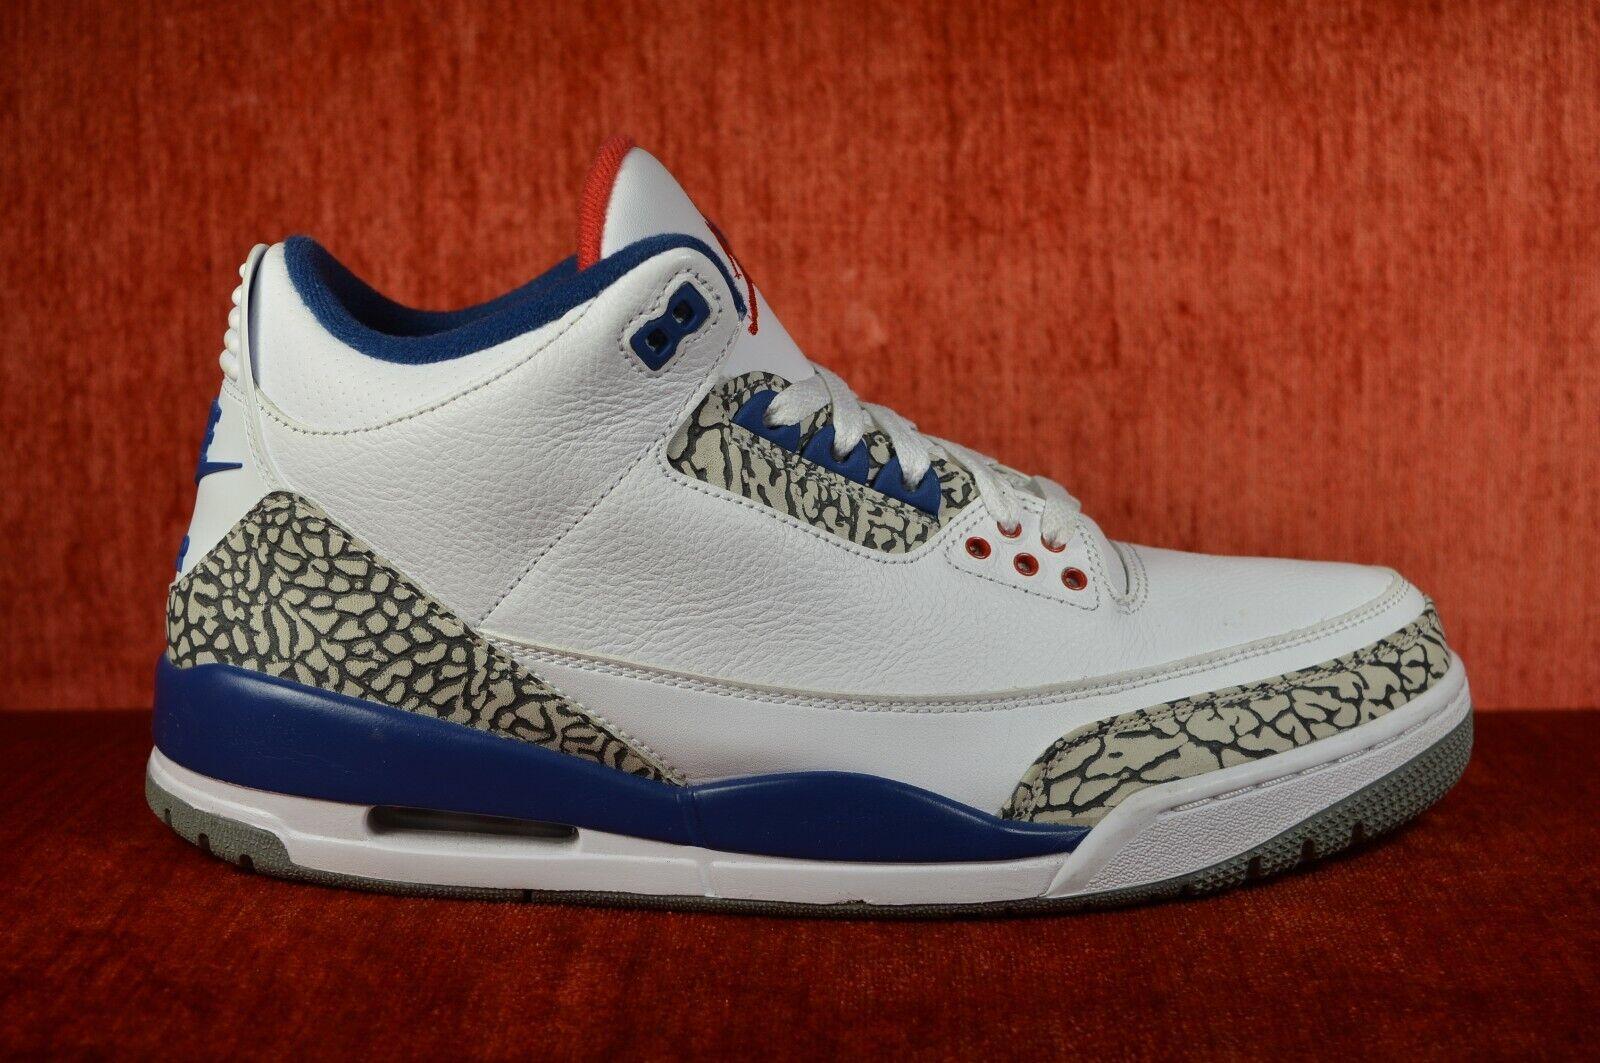 WORN TWICE Nike Air Jordan 3 True bluee Size 11 2016 854262-106 White Red